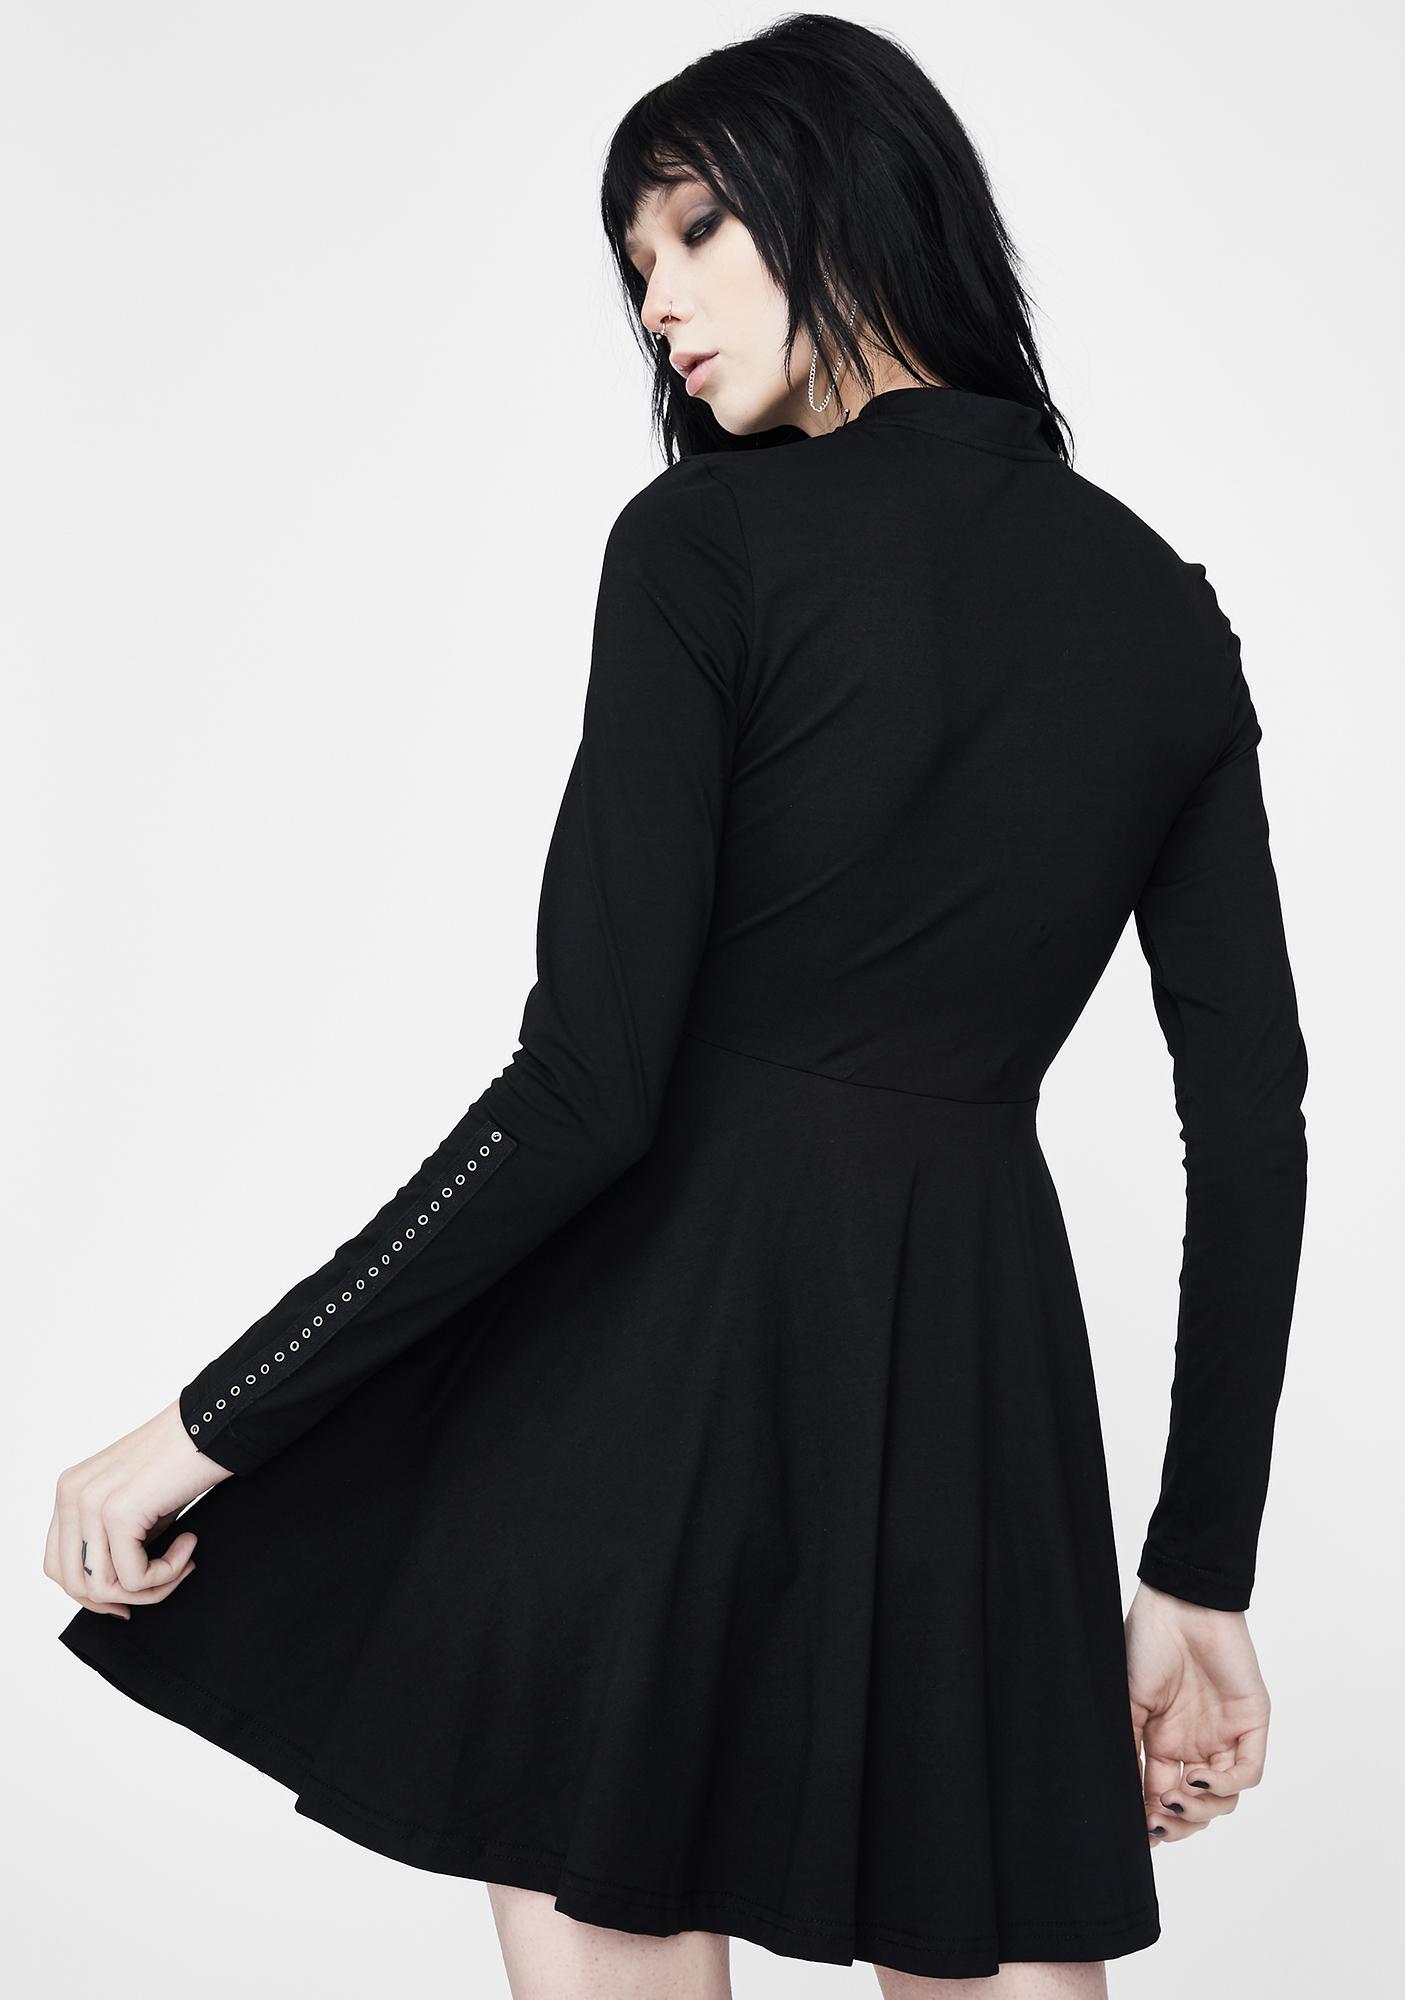 Punk Rave Zip Collar Knit Dress